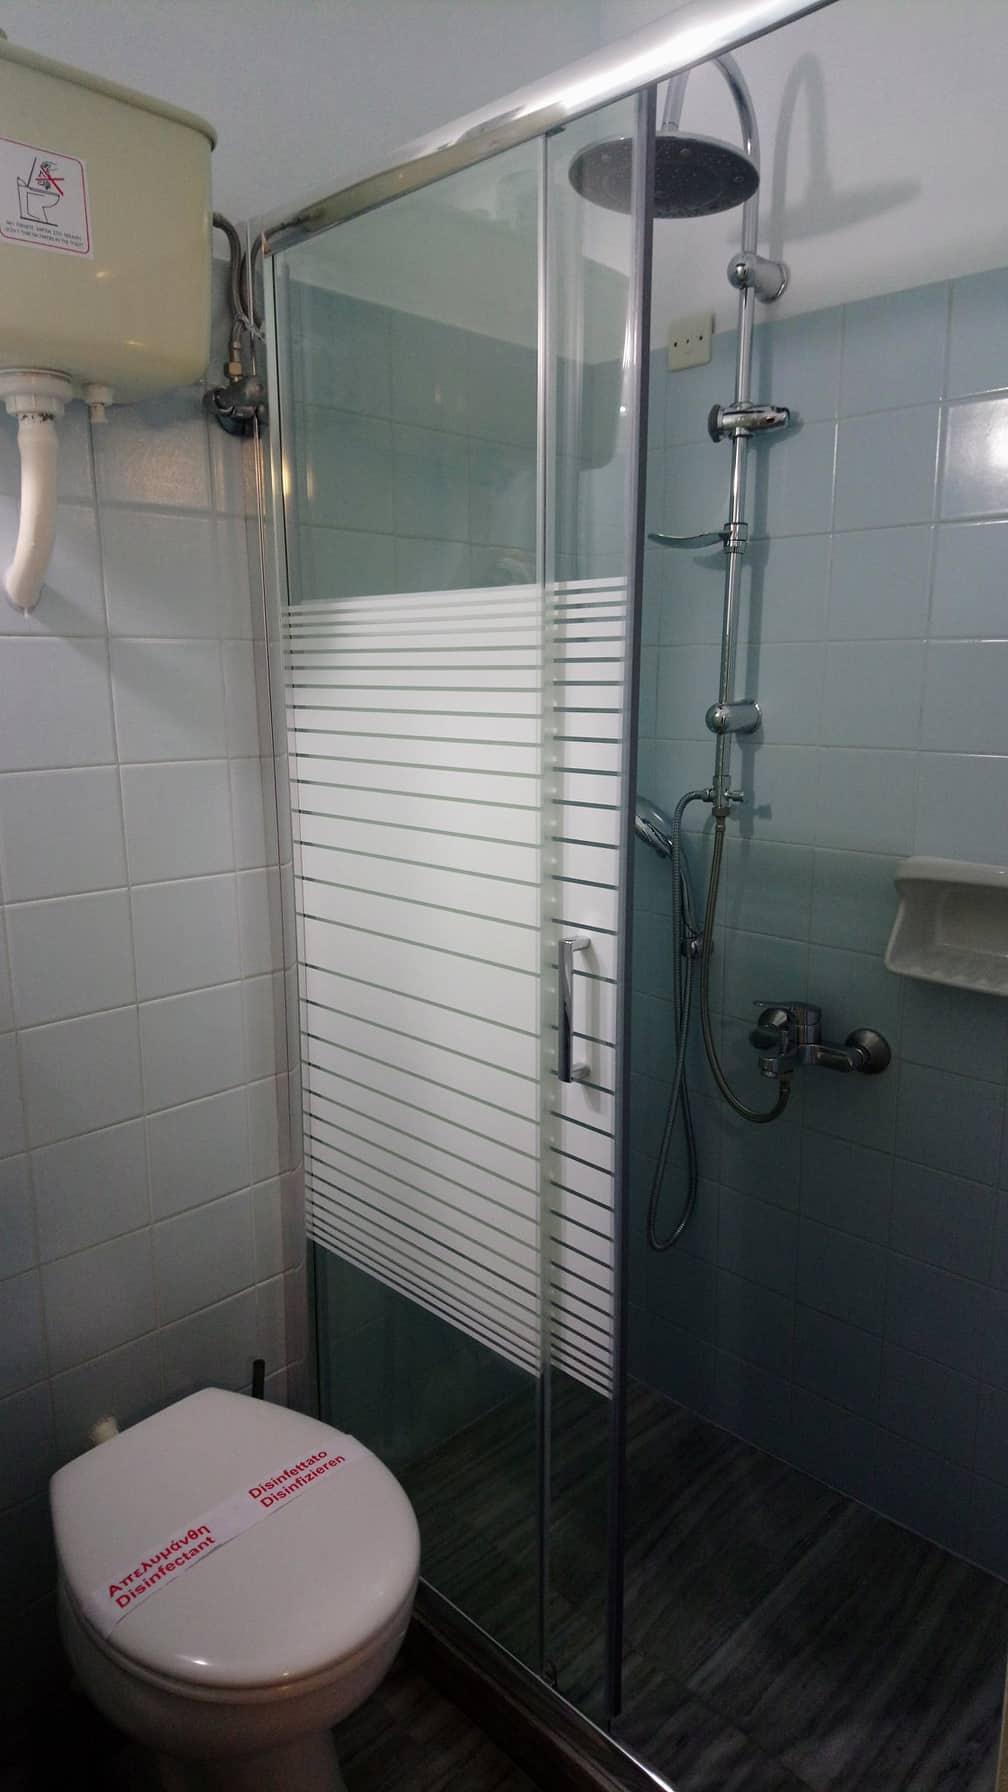 Pension-sofia-double-room-toilet1